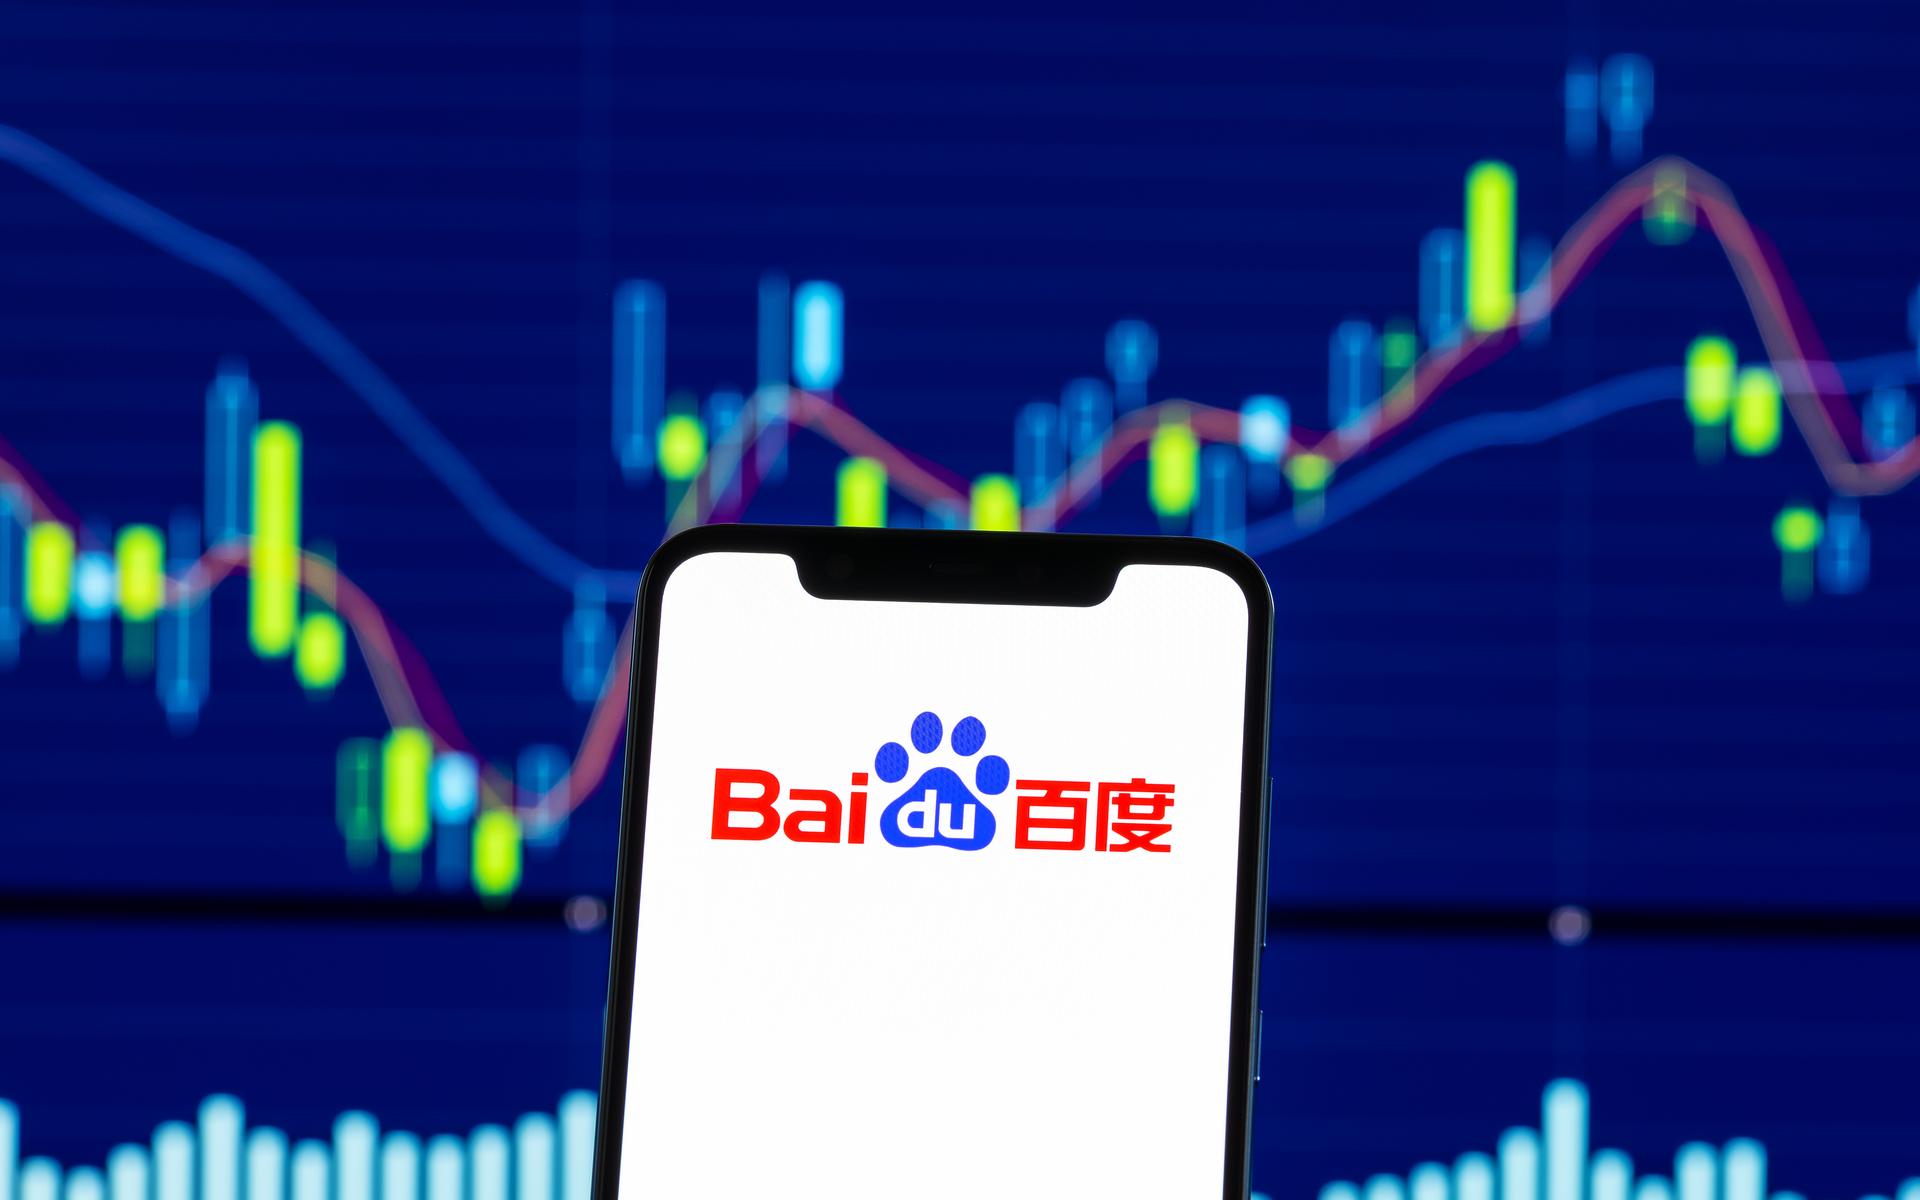 baidu china google trends bitcoin